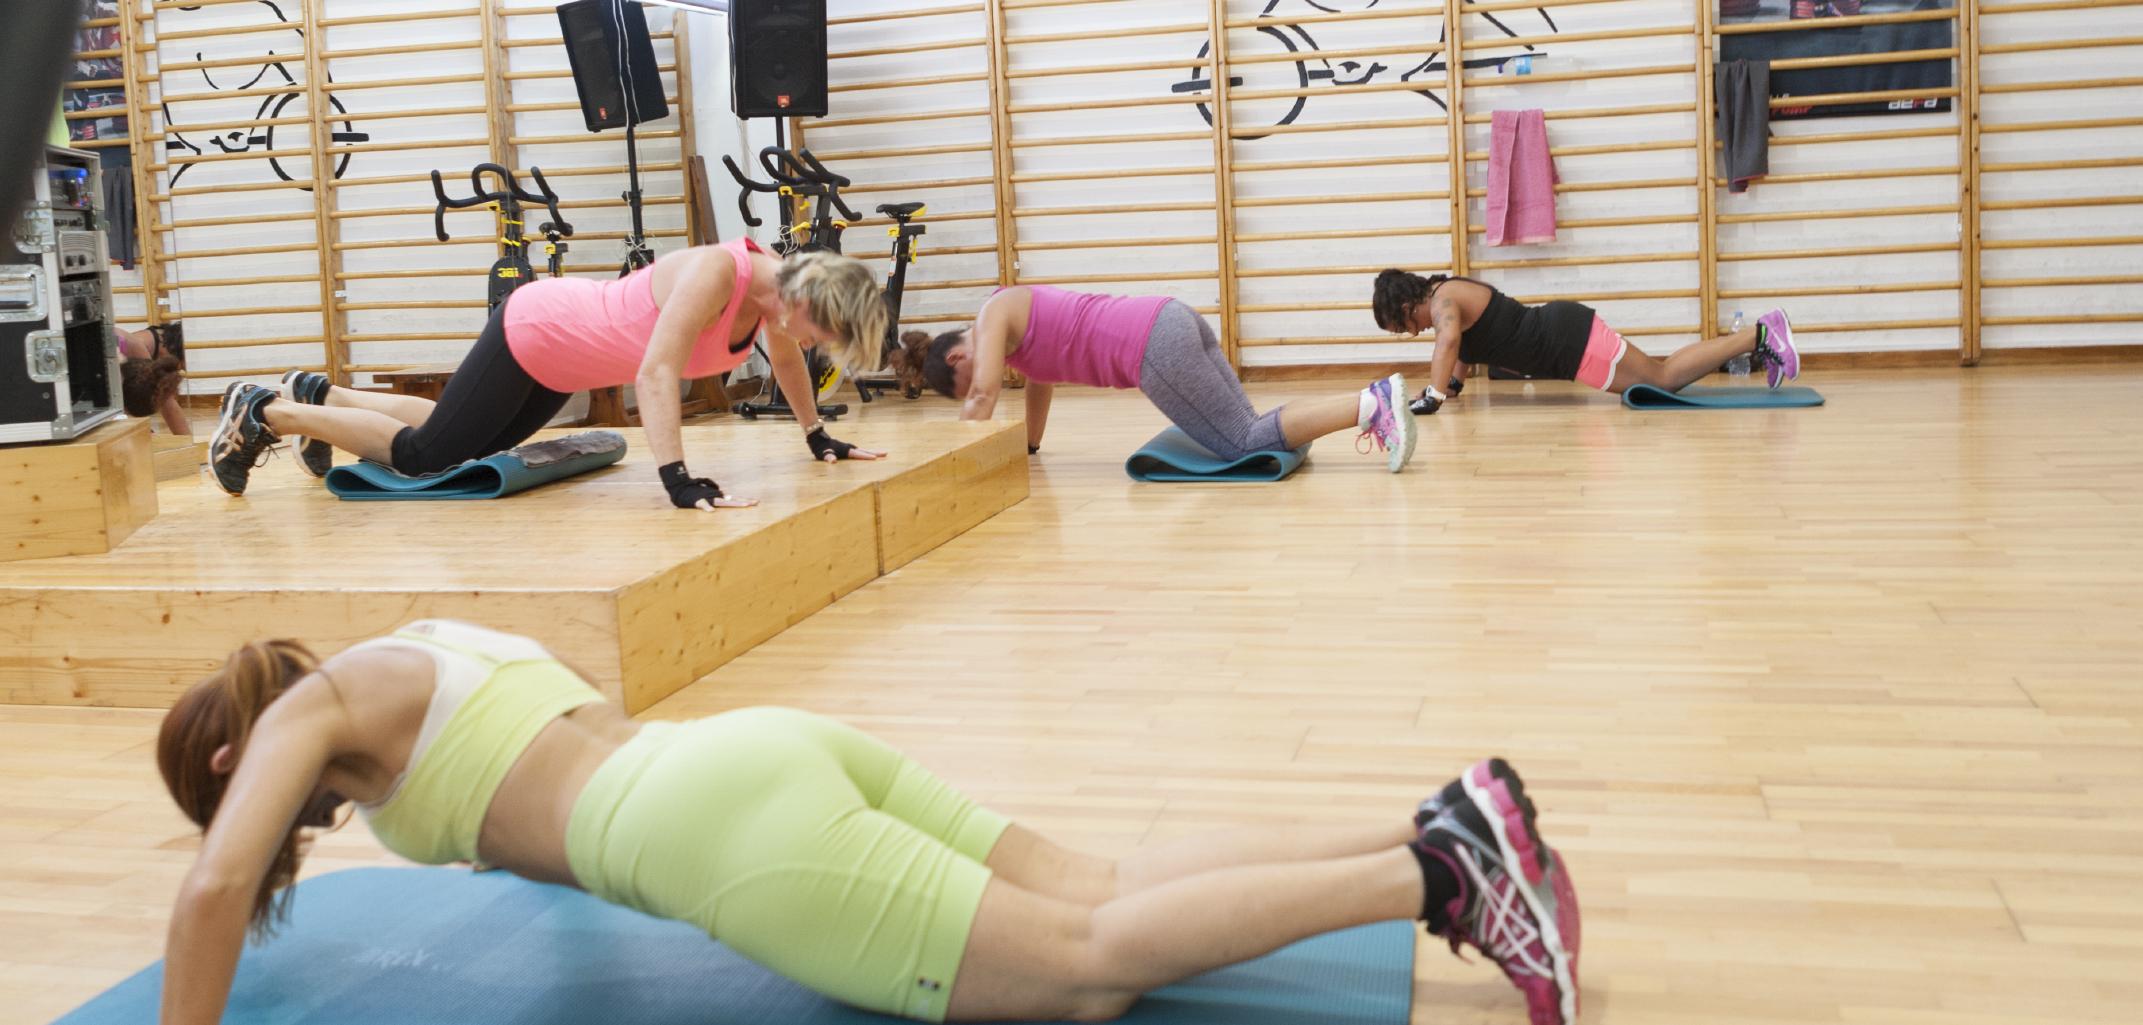 Fitness Rooms.Com